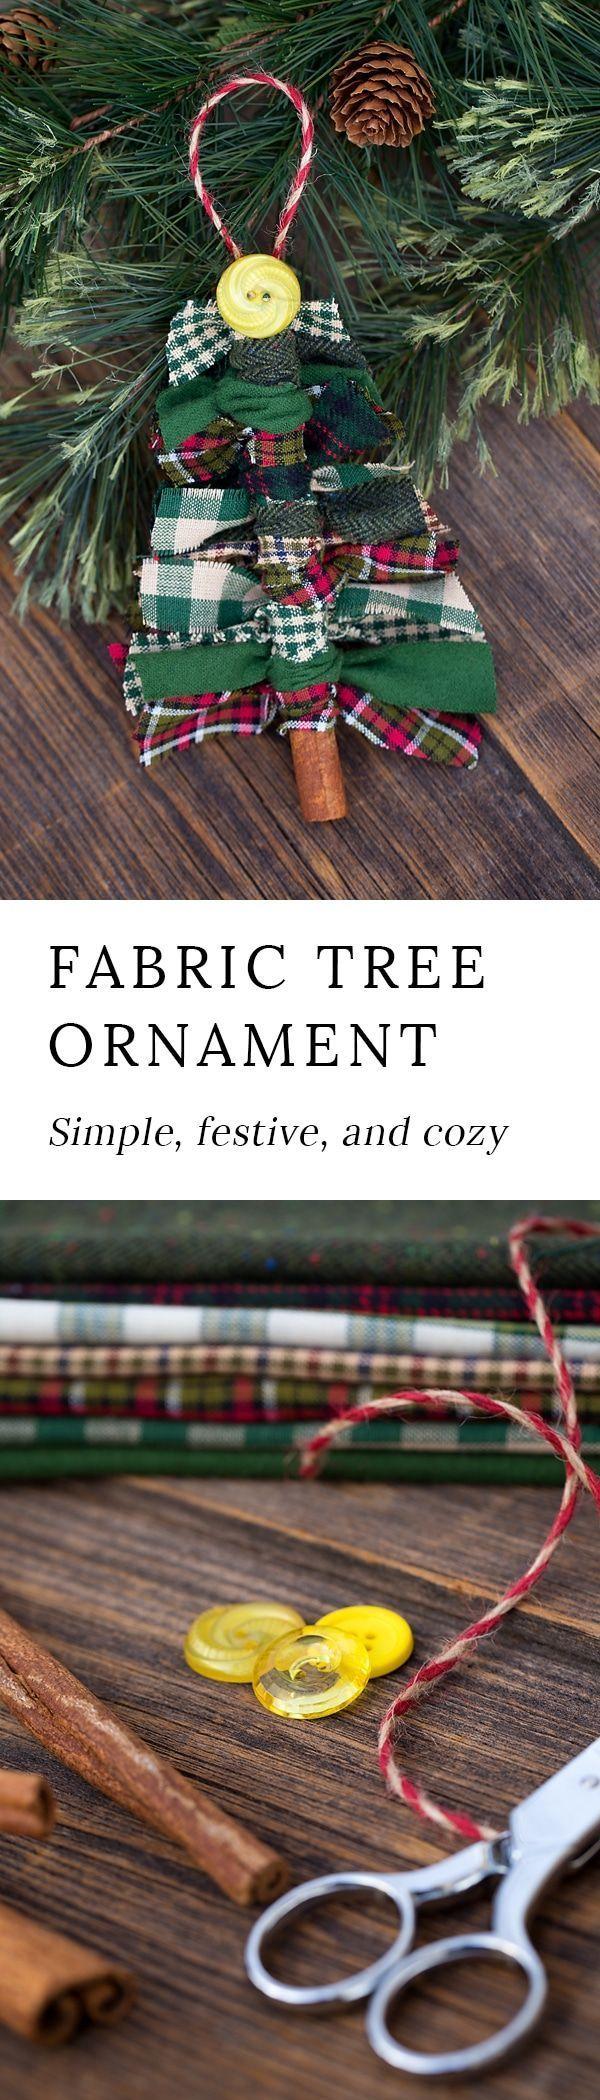 How to Make Scrap Fabric Tree Ornaments #scrapfabric